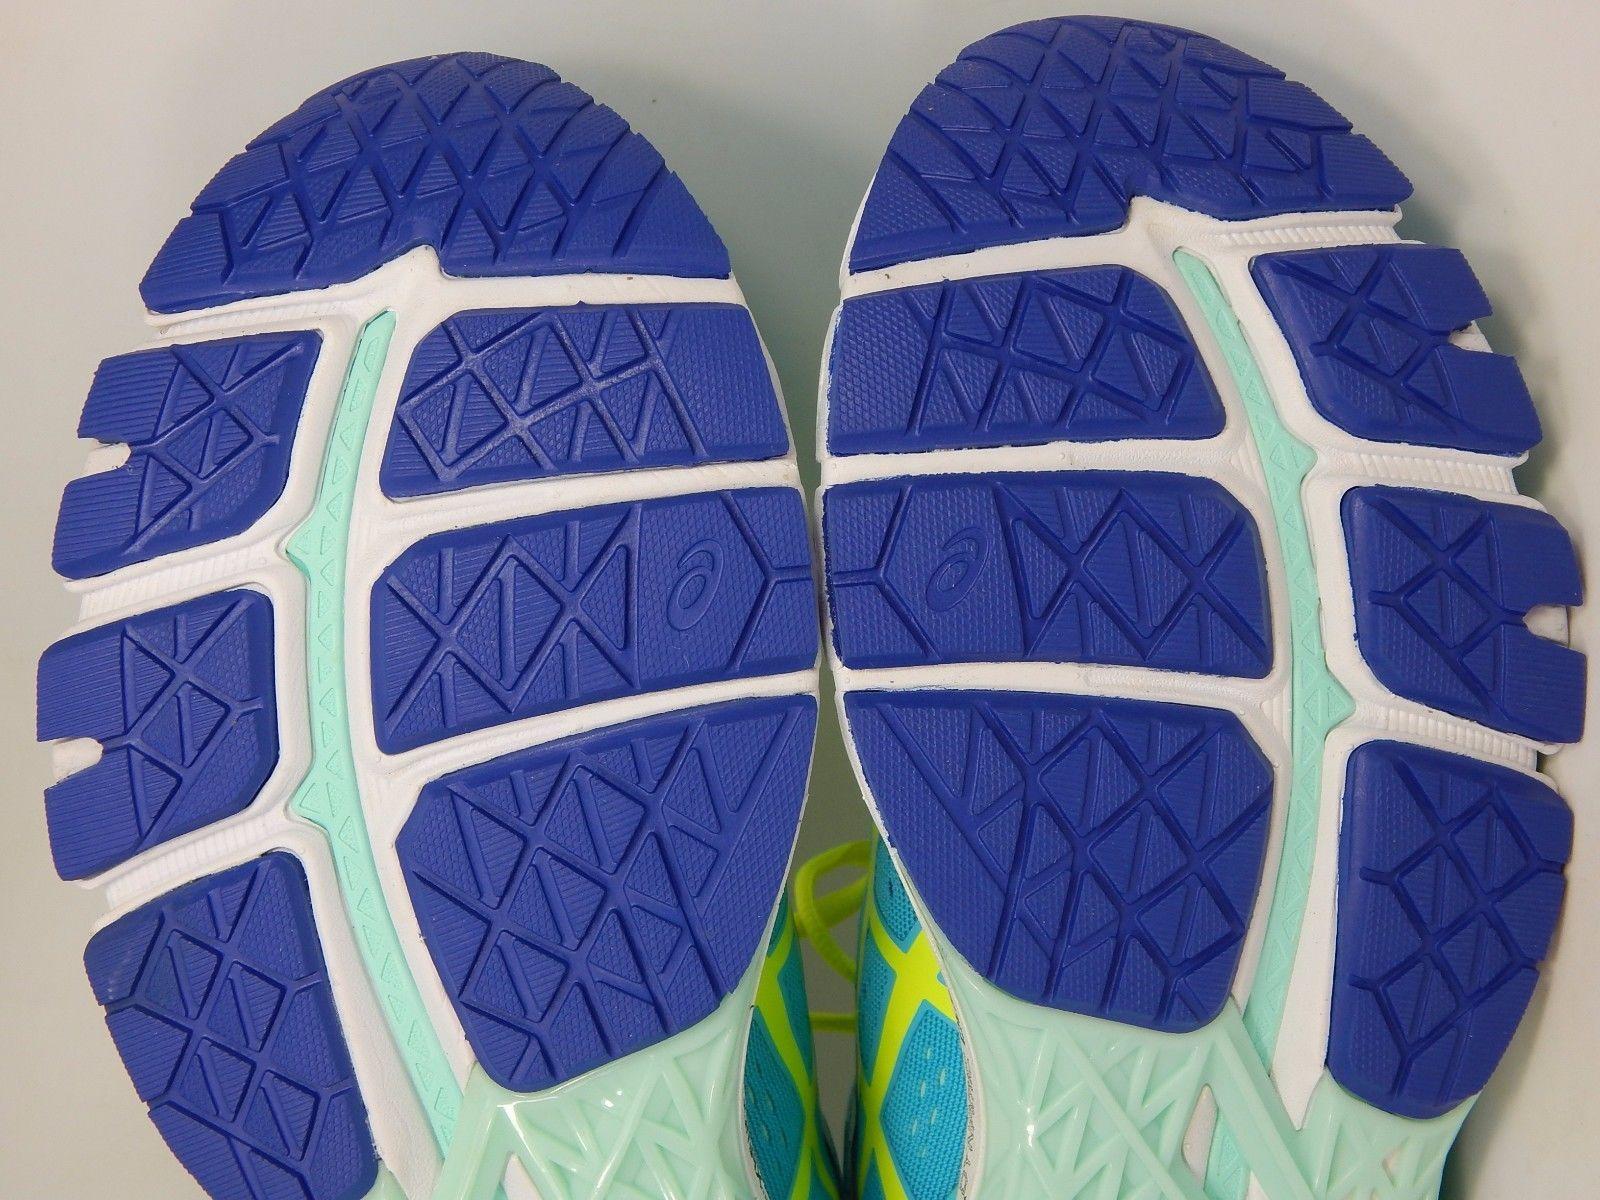 Asics Gel Kayano 22 Women's Running Shoes Size US 12.5 M (B) EU 45 Blue T597N